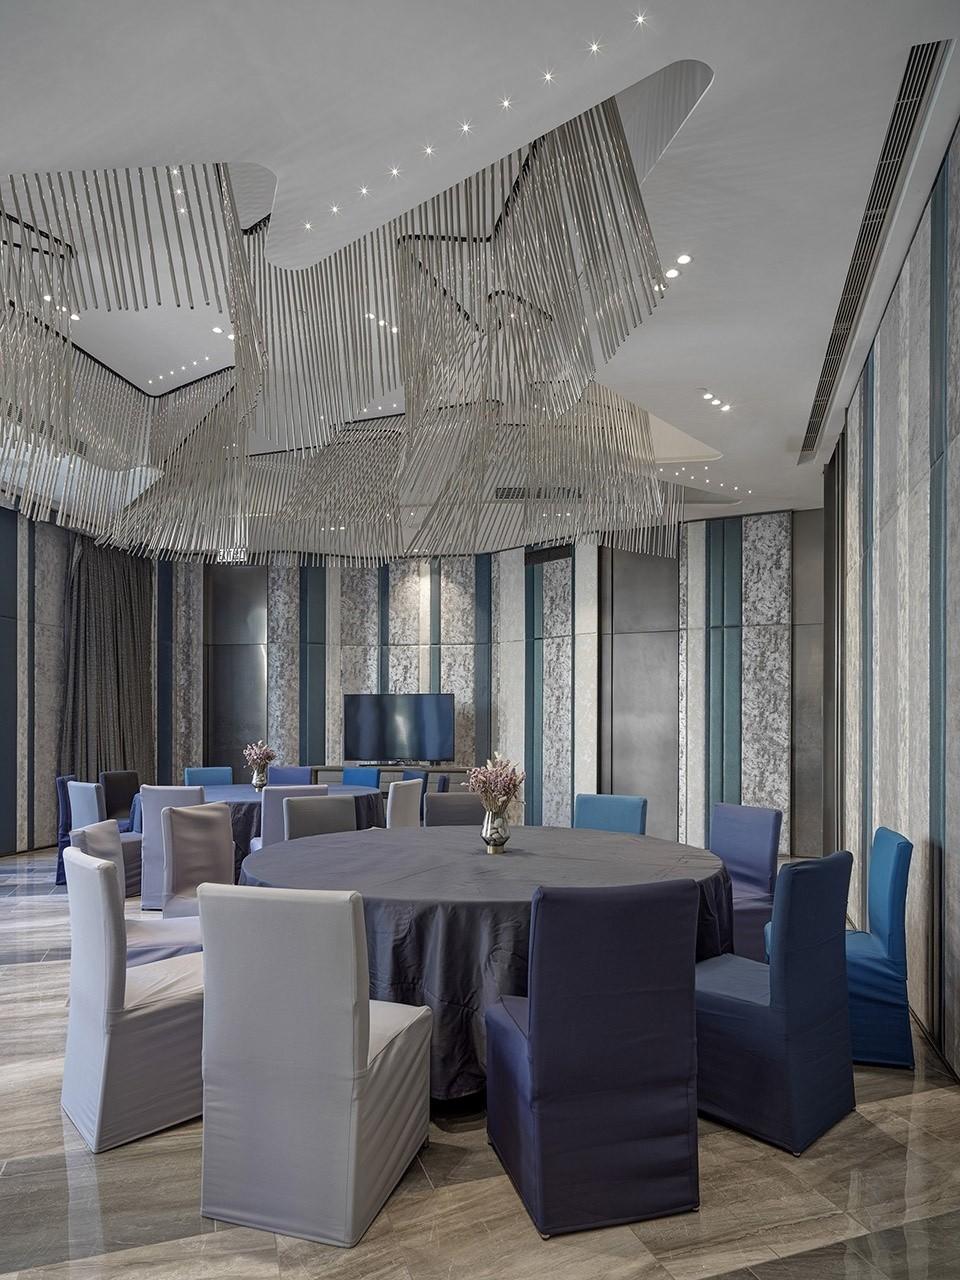 016-tseung-kwan-o-alto-residences-clubhouse-china-by-one-plus-partnership-960x1280.jpg